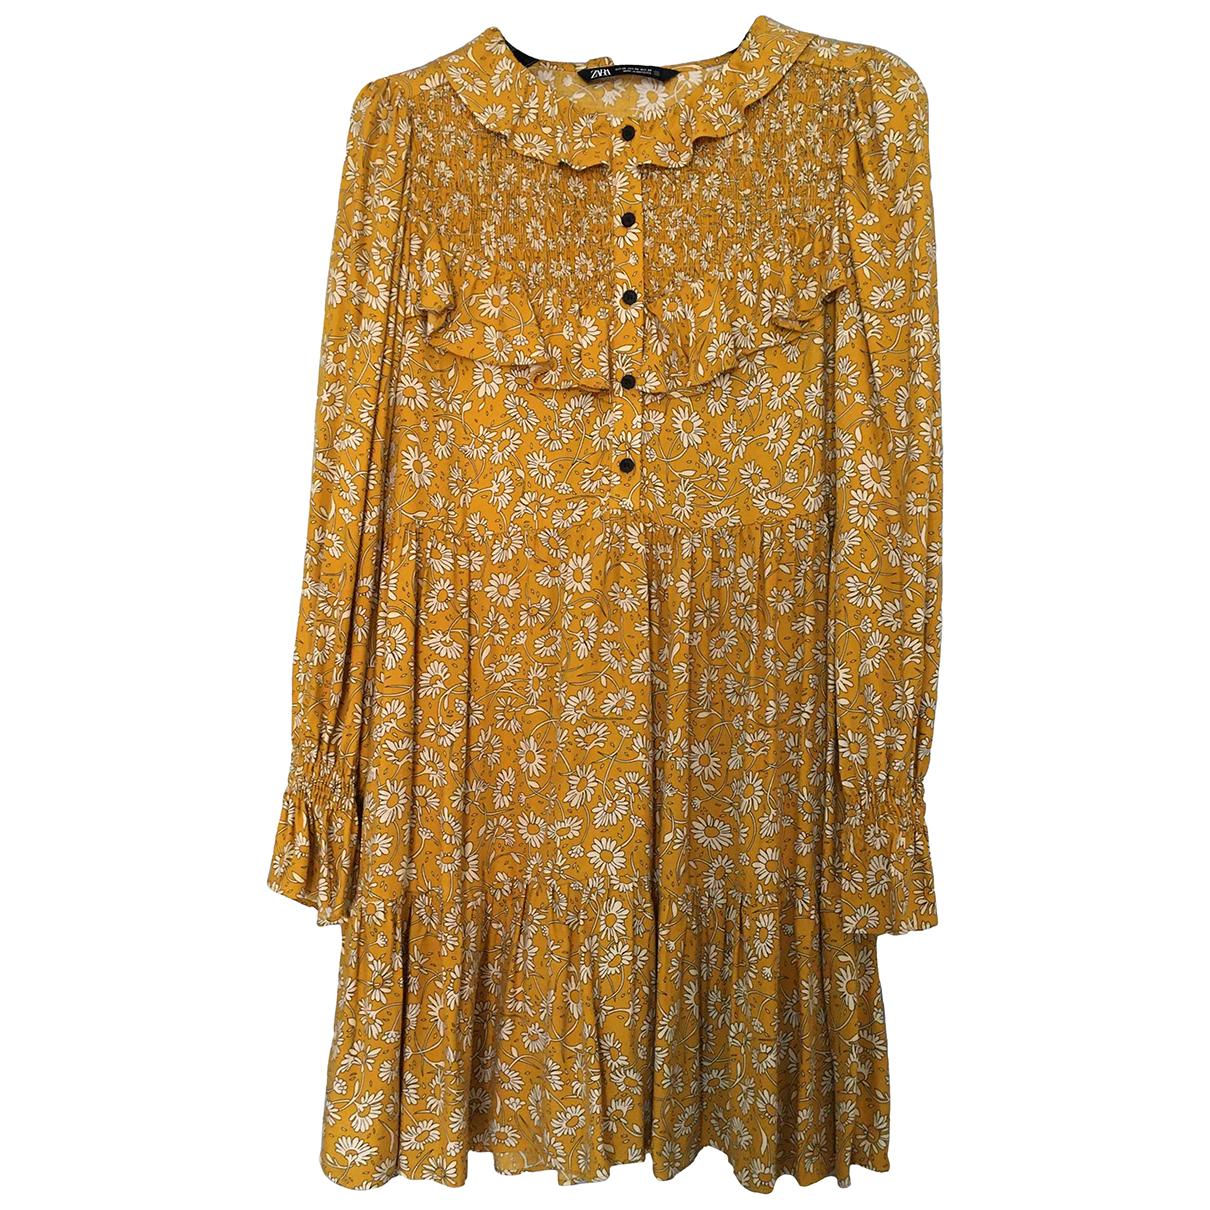 Zara \N dress for Women XS International